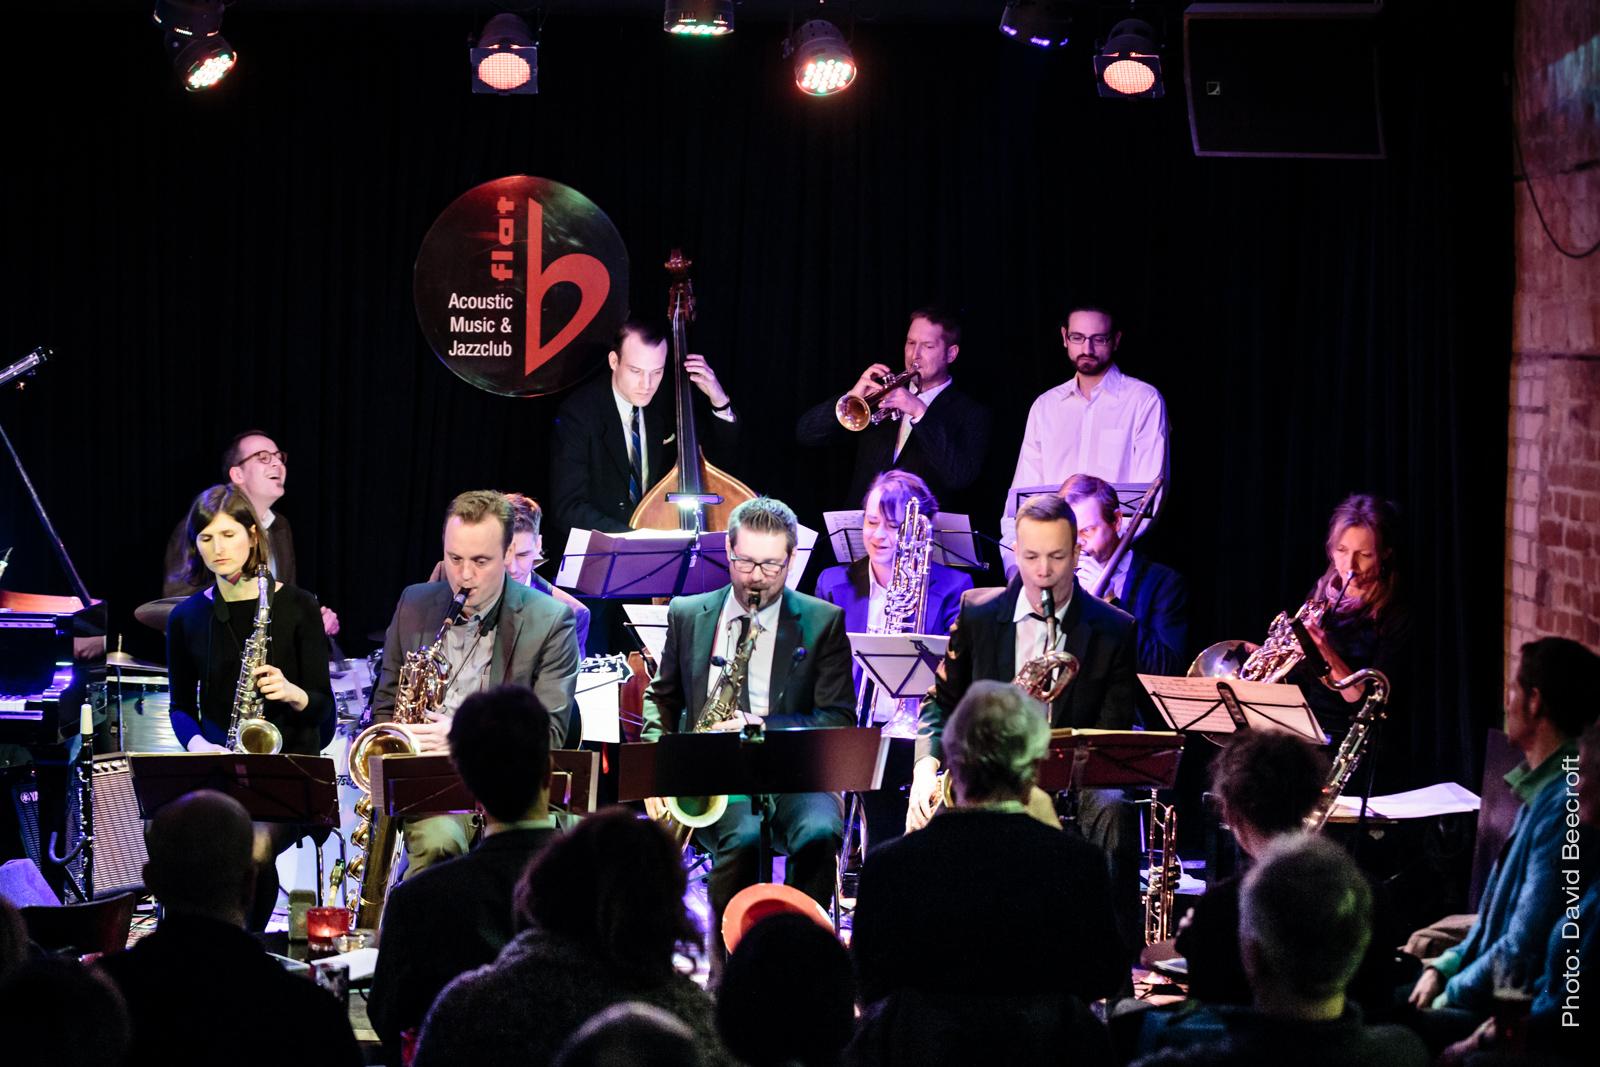 B Flat Accoustic Music & Jazz Club Berlin